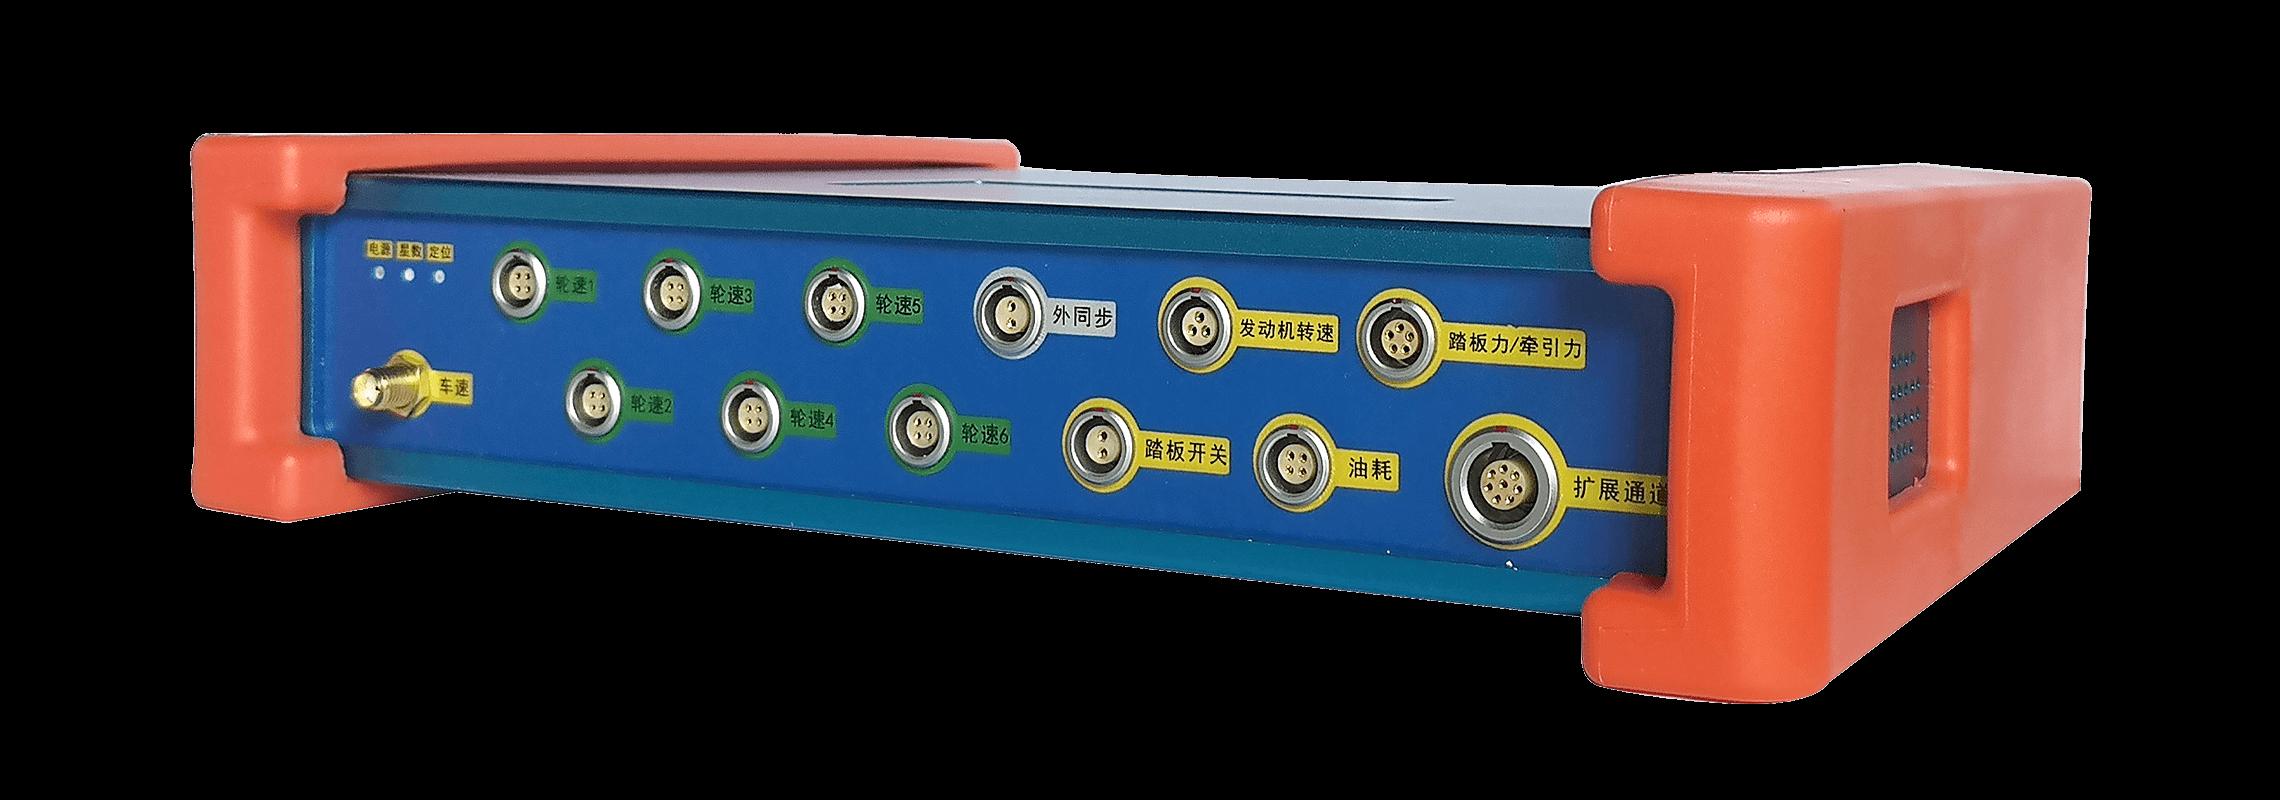 PCM-6851A数据采集器